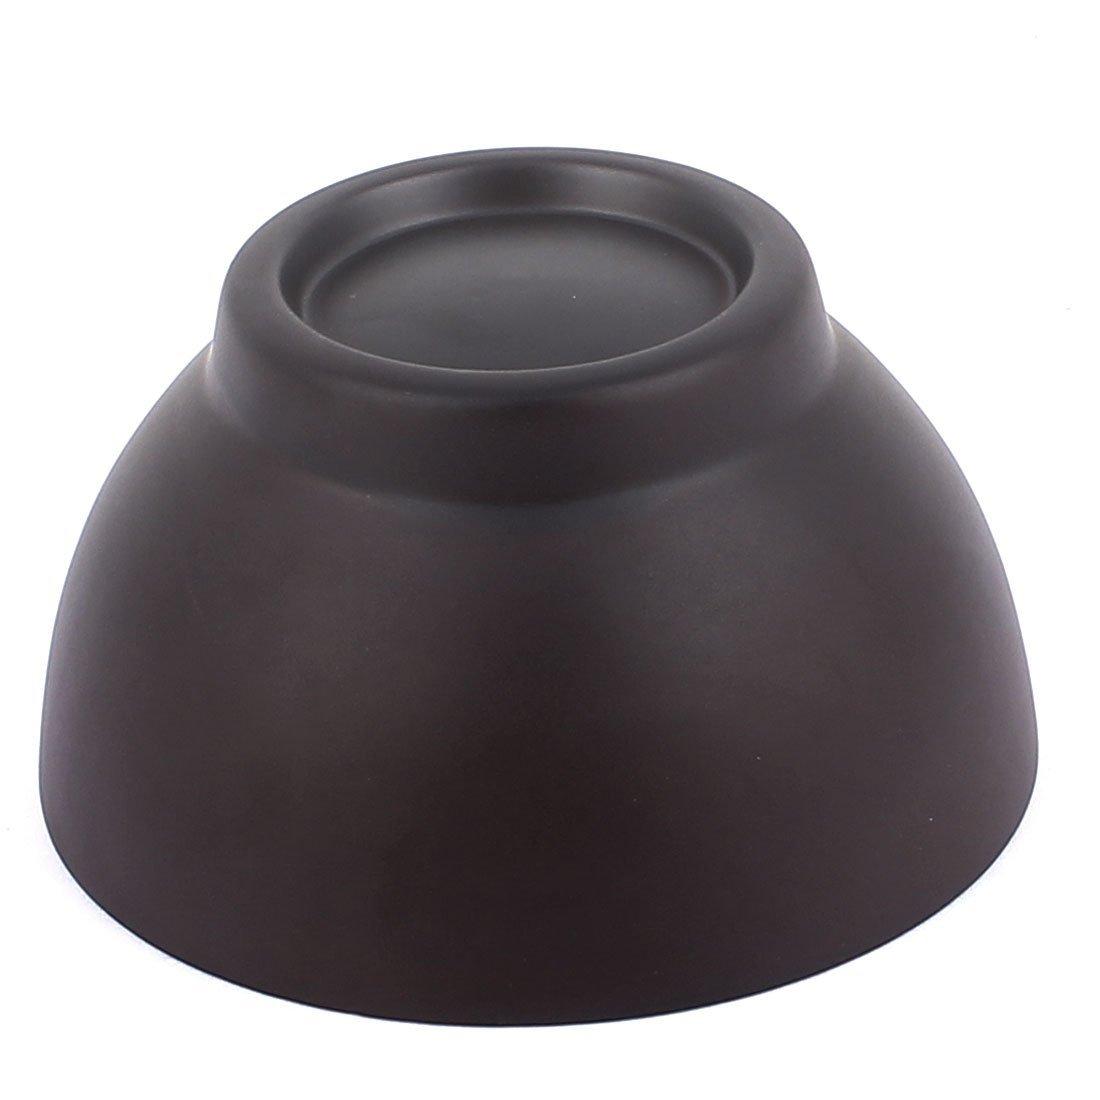 Amazon.com: DealMux de madeira redonda Food prato de arroz bacia bandeja 10 cm de diâmetro Brown: Home & Kitchen